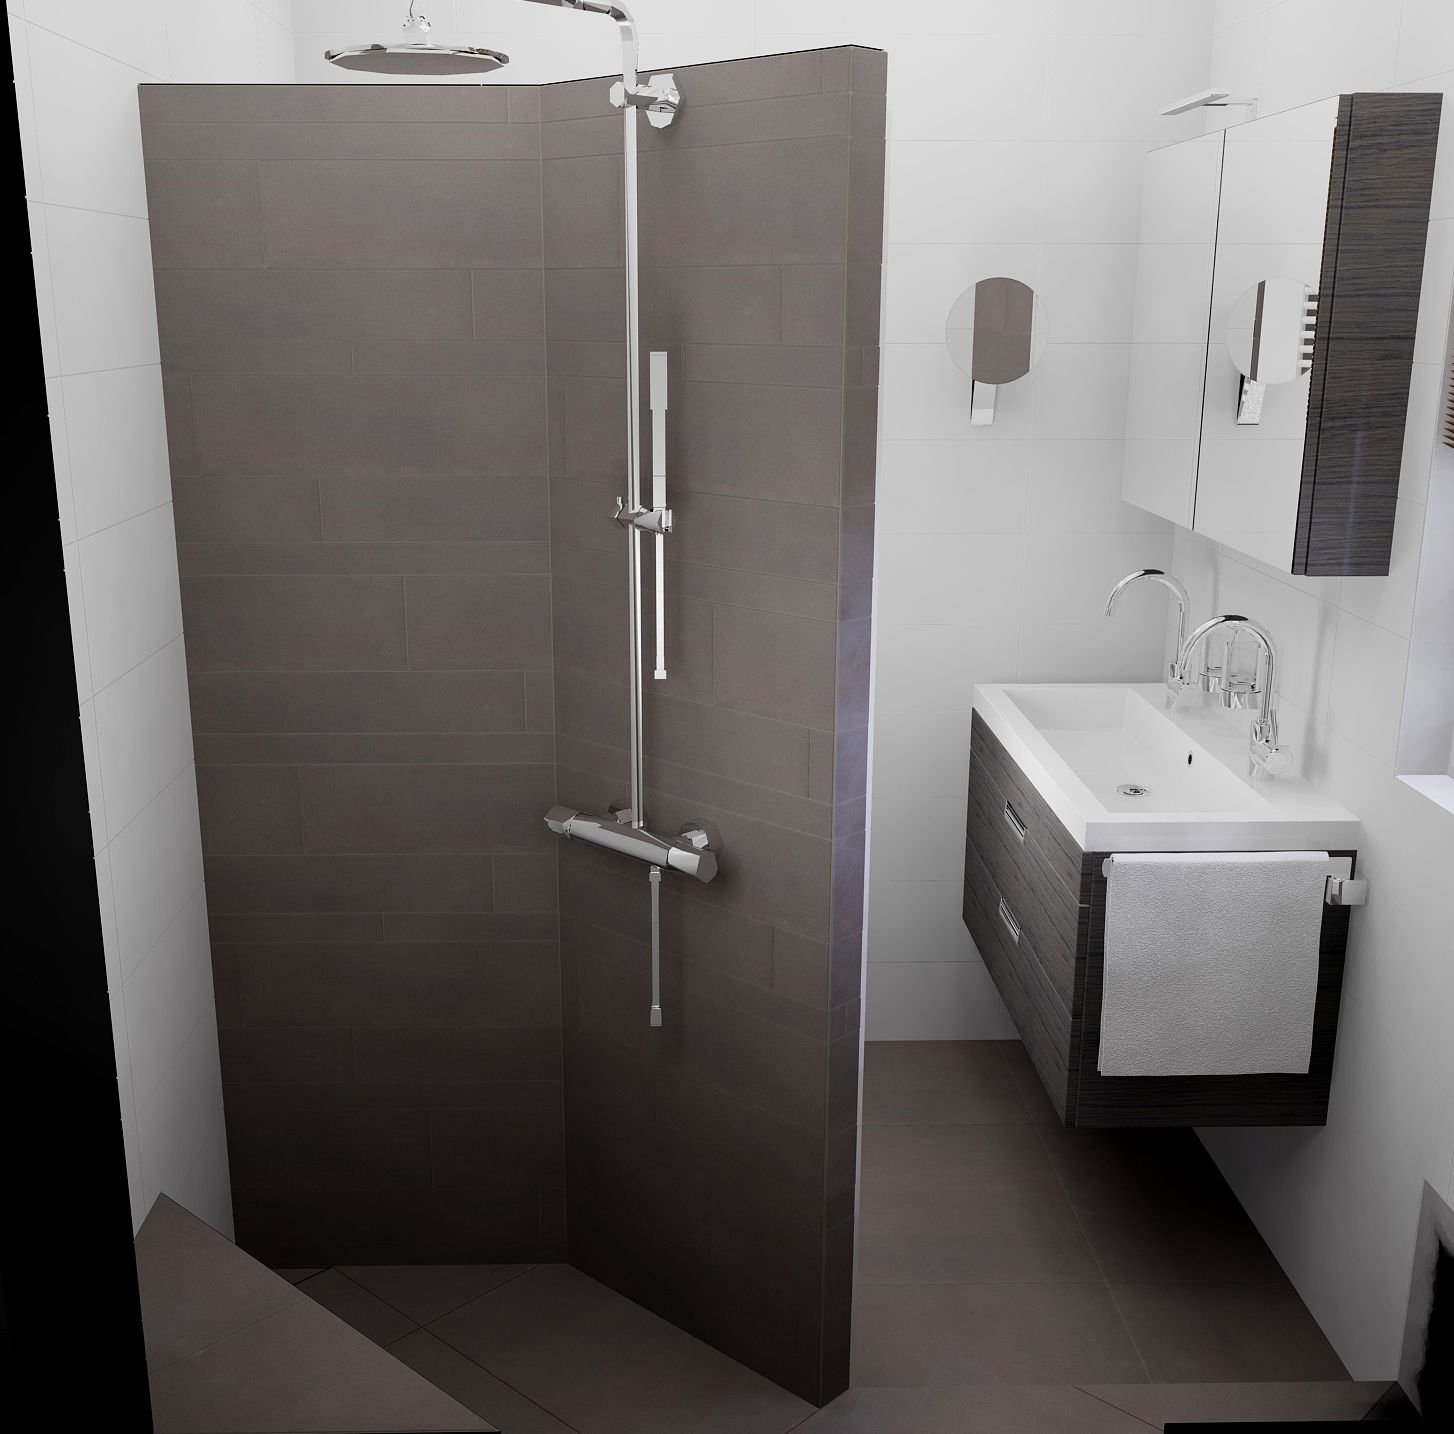 Kleine badkamer van 200x187cm met inloopdouche gratis ontwerpen op sani kleine - Foto kleine badkamer ...